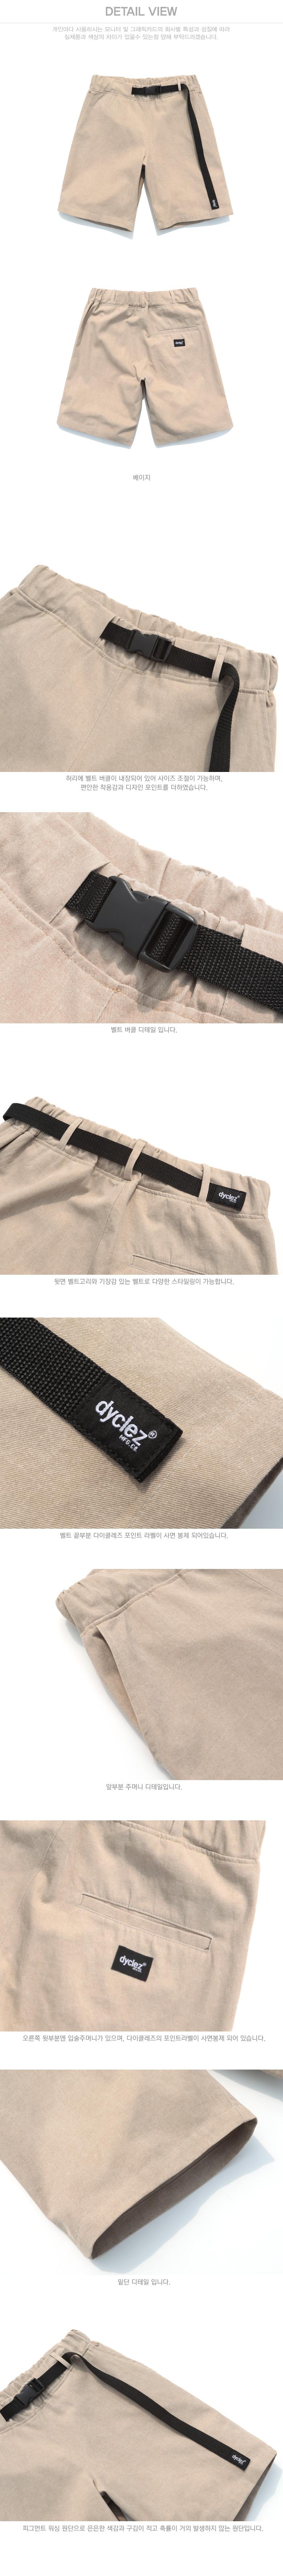 20180404_dy_pigment_short_pants_detail_beige_kj.jpg